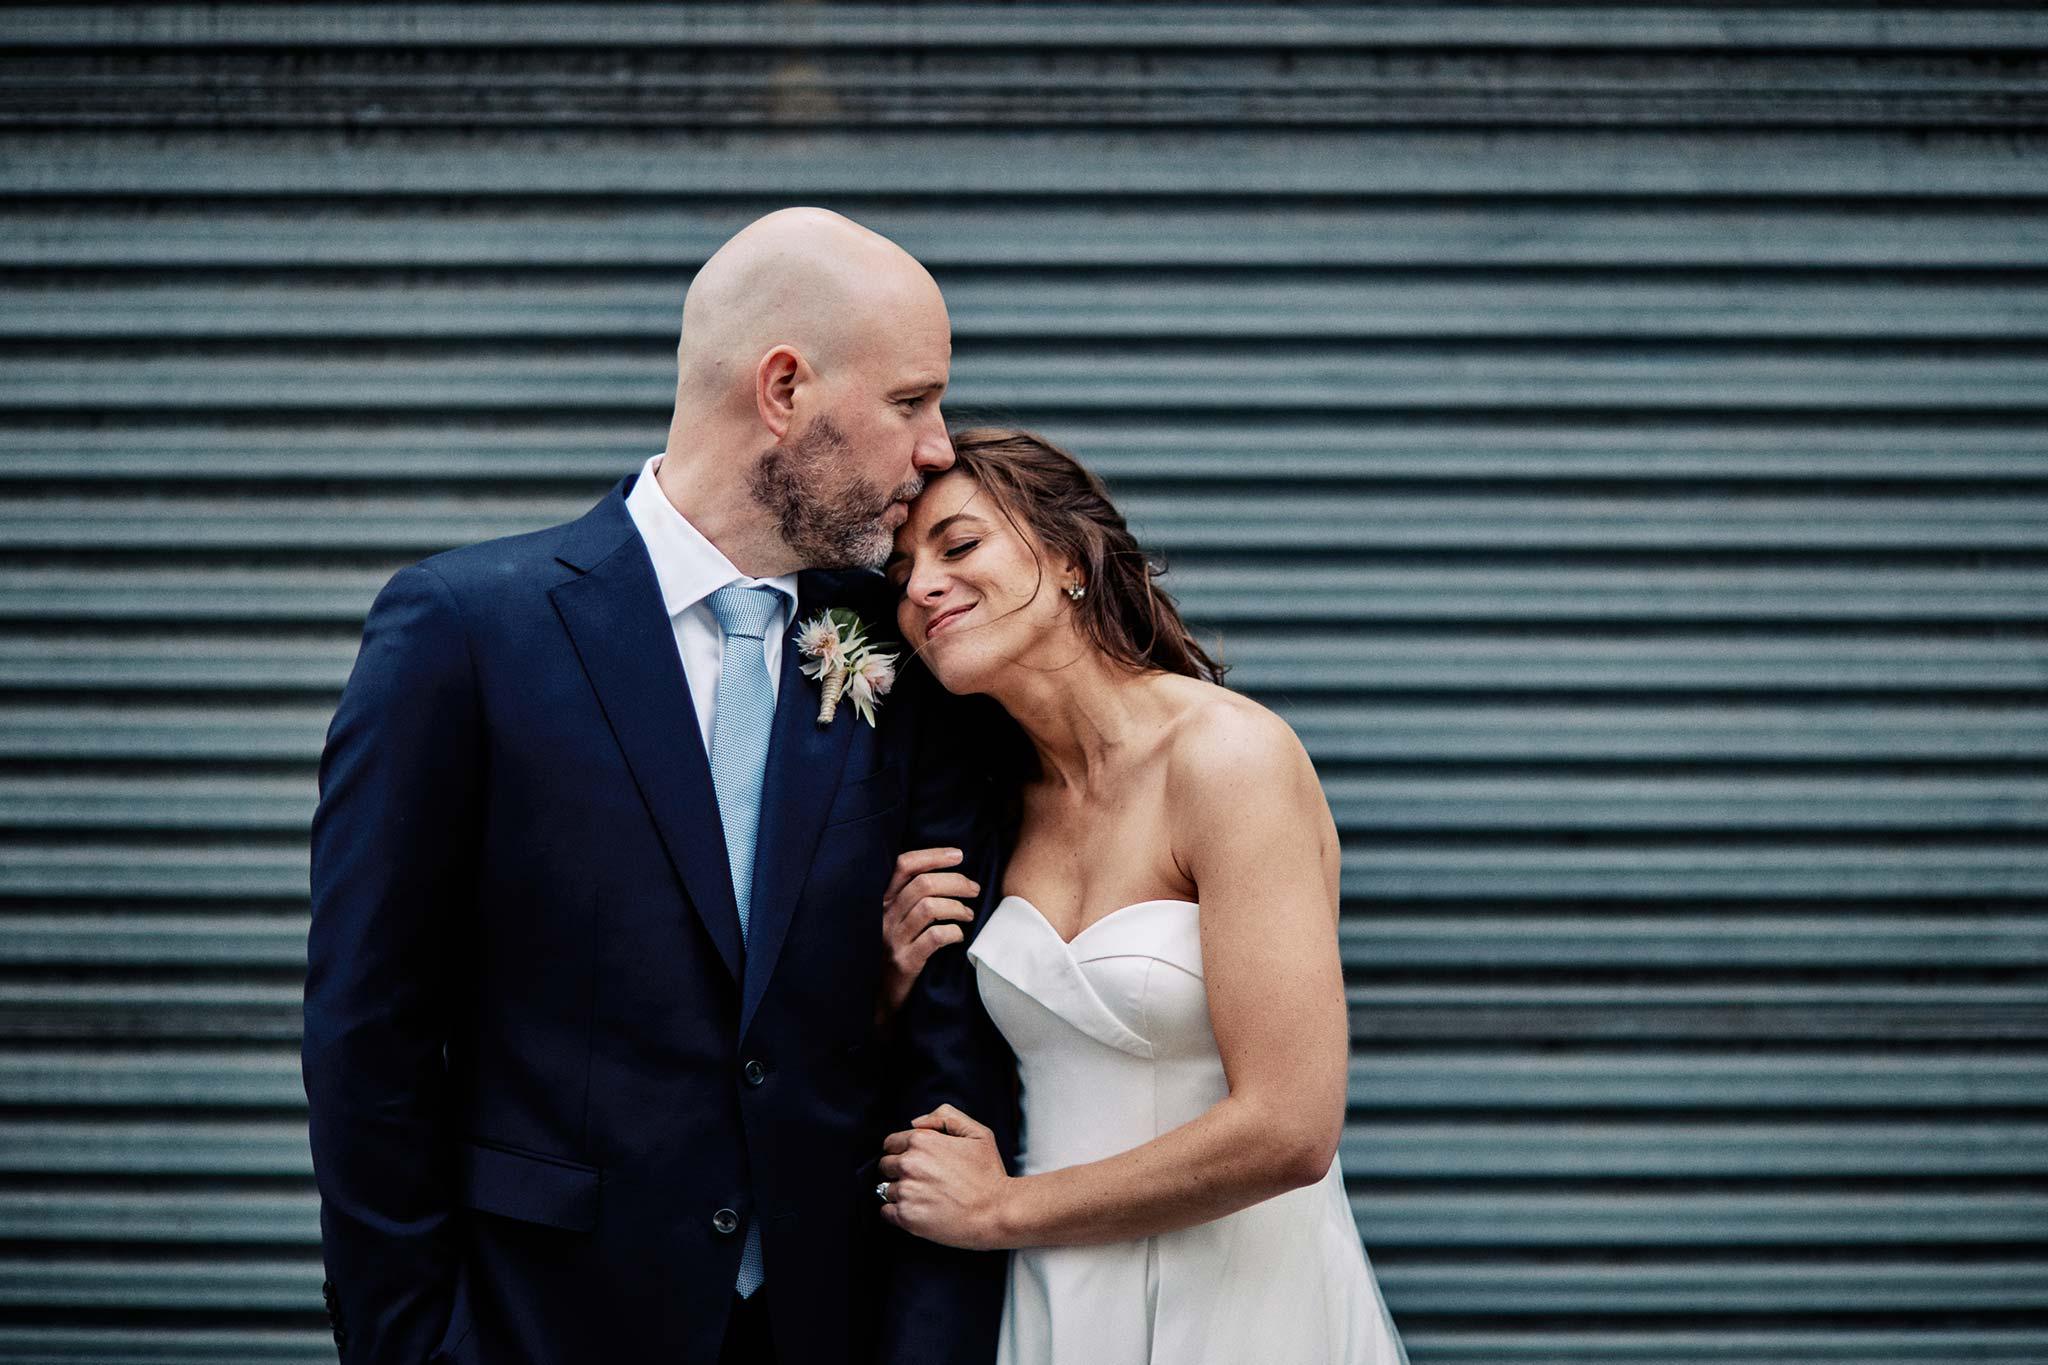 East Melbourne Wedding Photographer Bride Groom embrace rustic backdrop